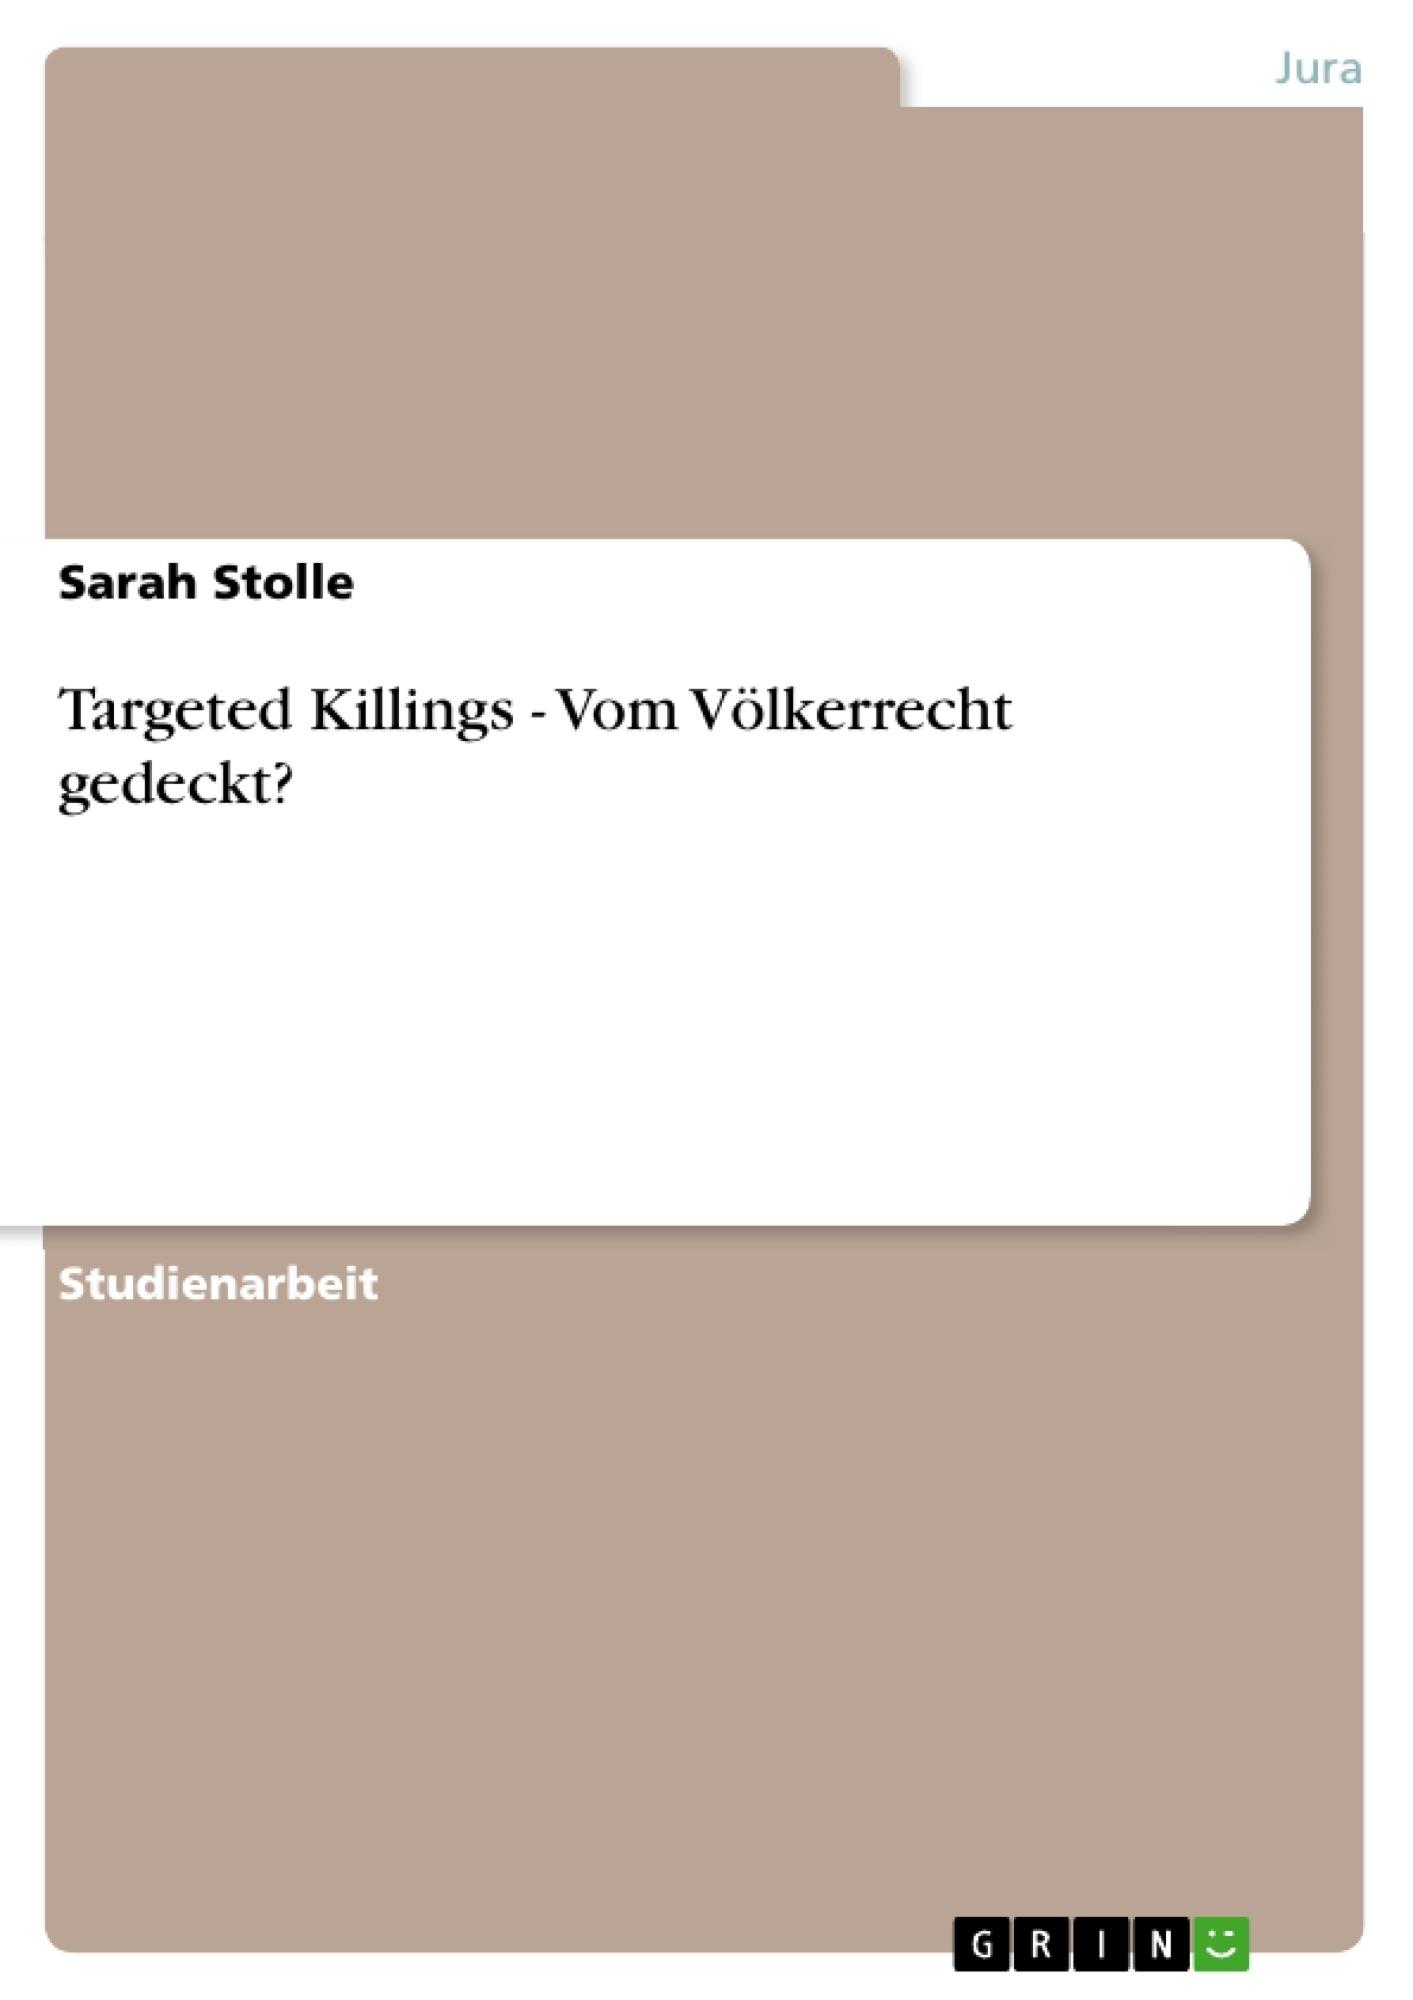 Titel: Targeted Killings - Vom Völkerrecht gedeckt?